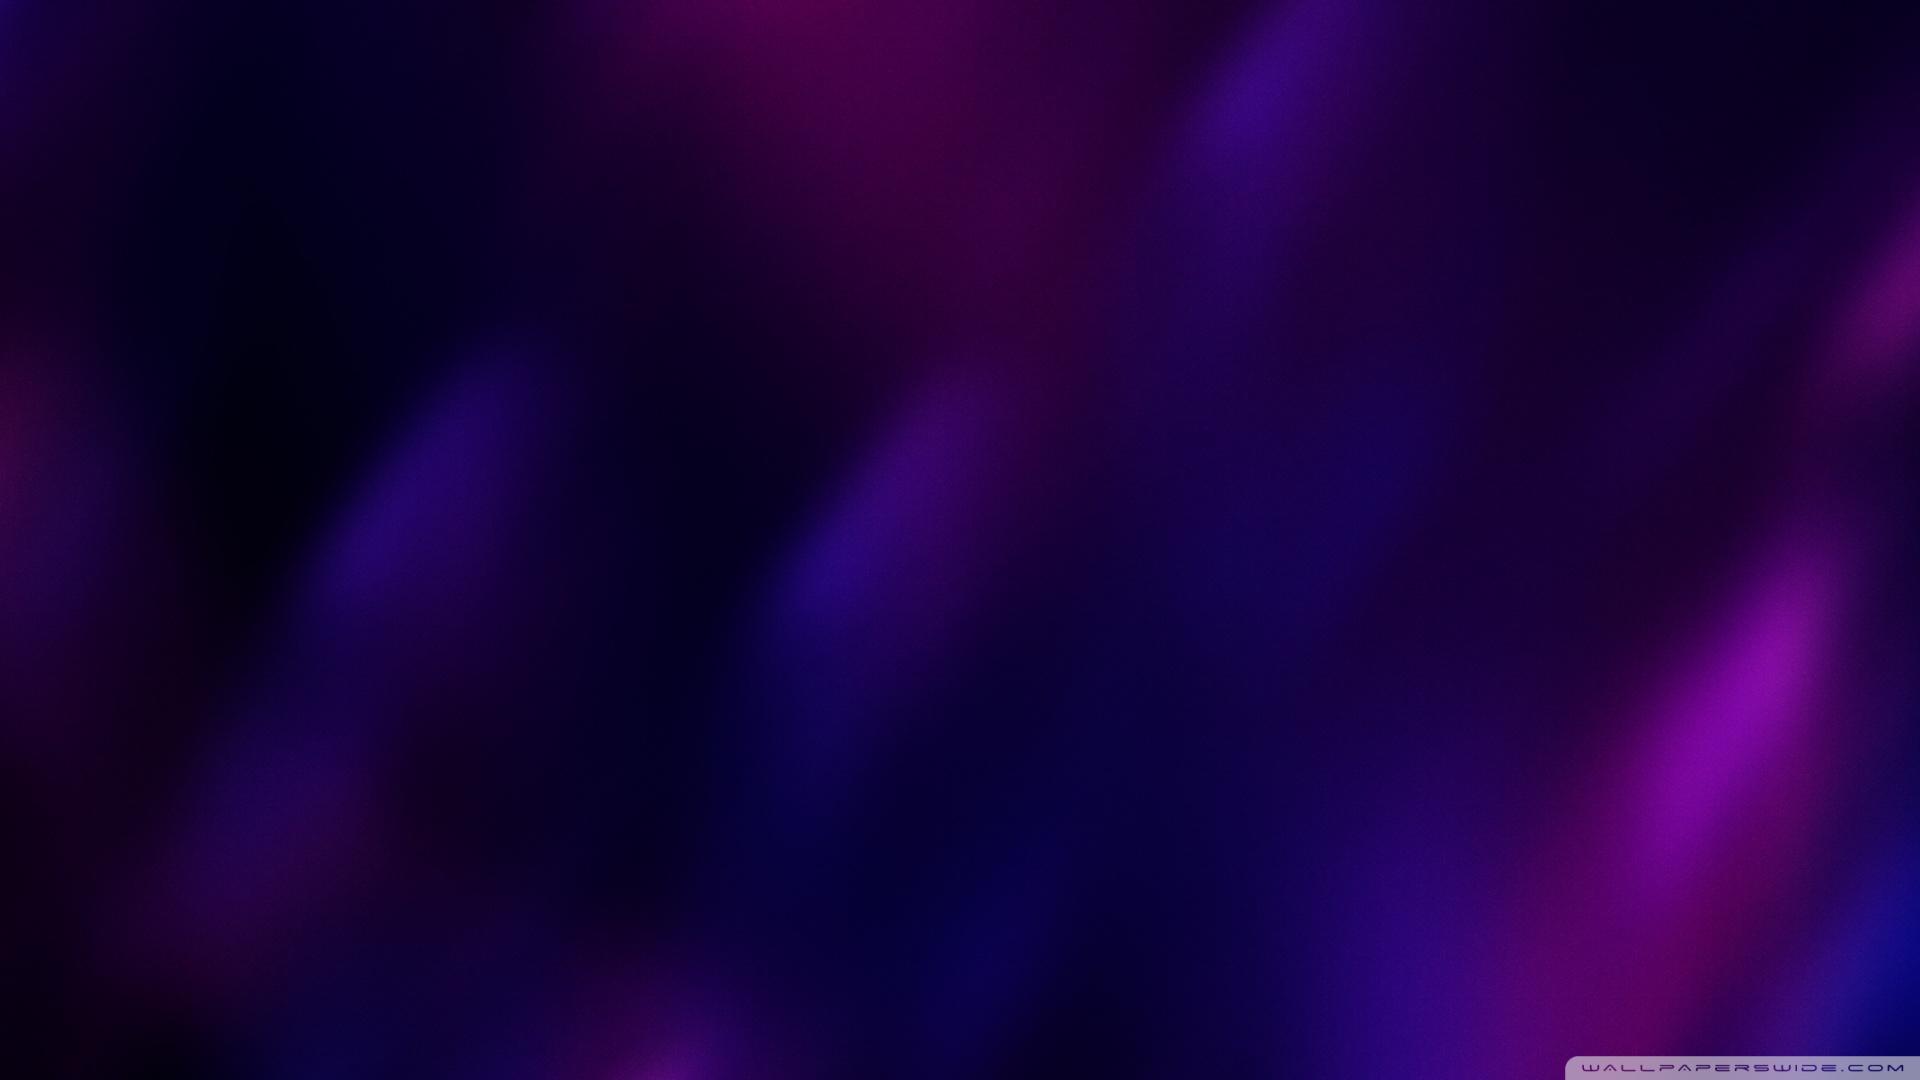 Dark Purple Colors Wallpaper 1920x1080 Dark Purple Colors 1920x1080